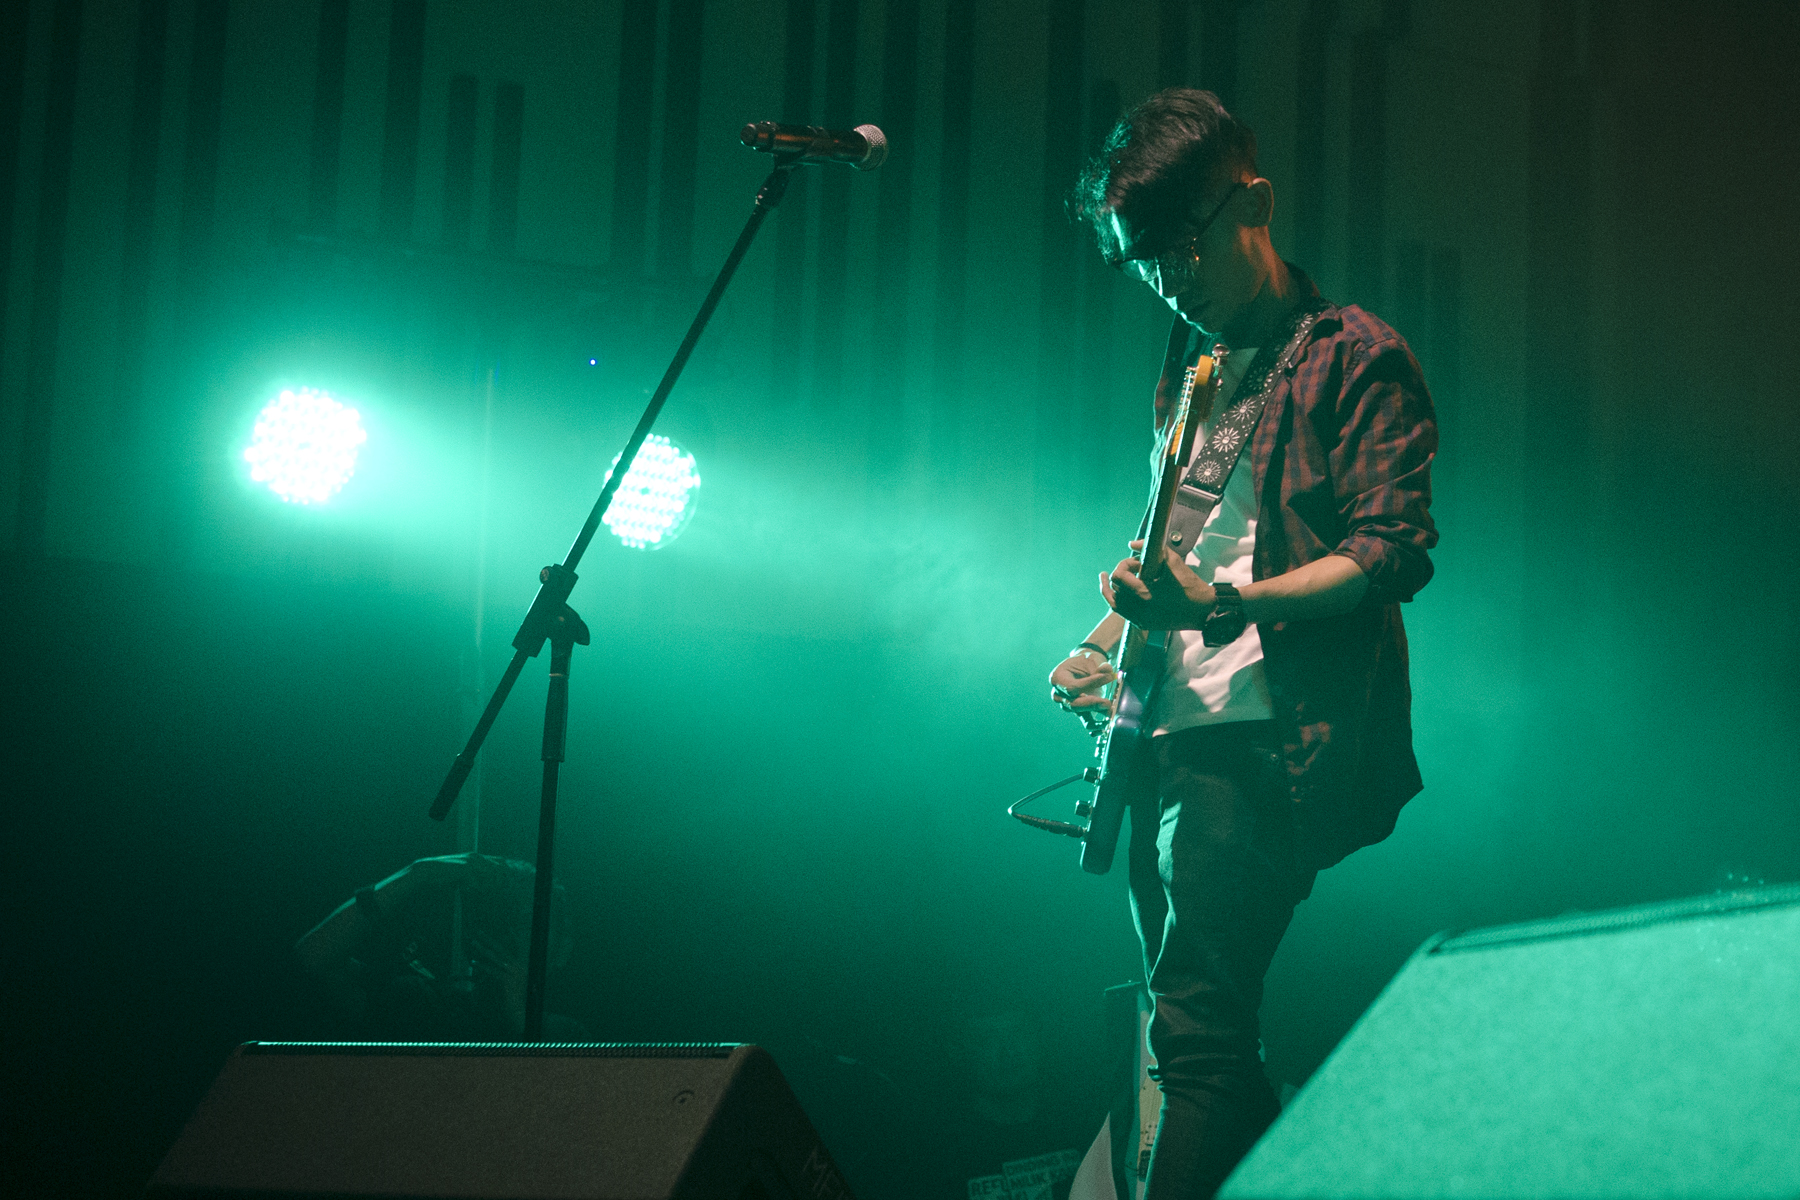 Milo Dinosaur - Live at Buka Panggung, 19/1/2019